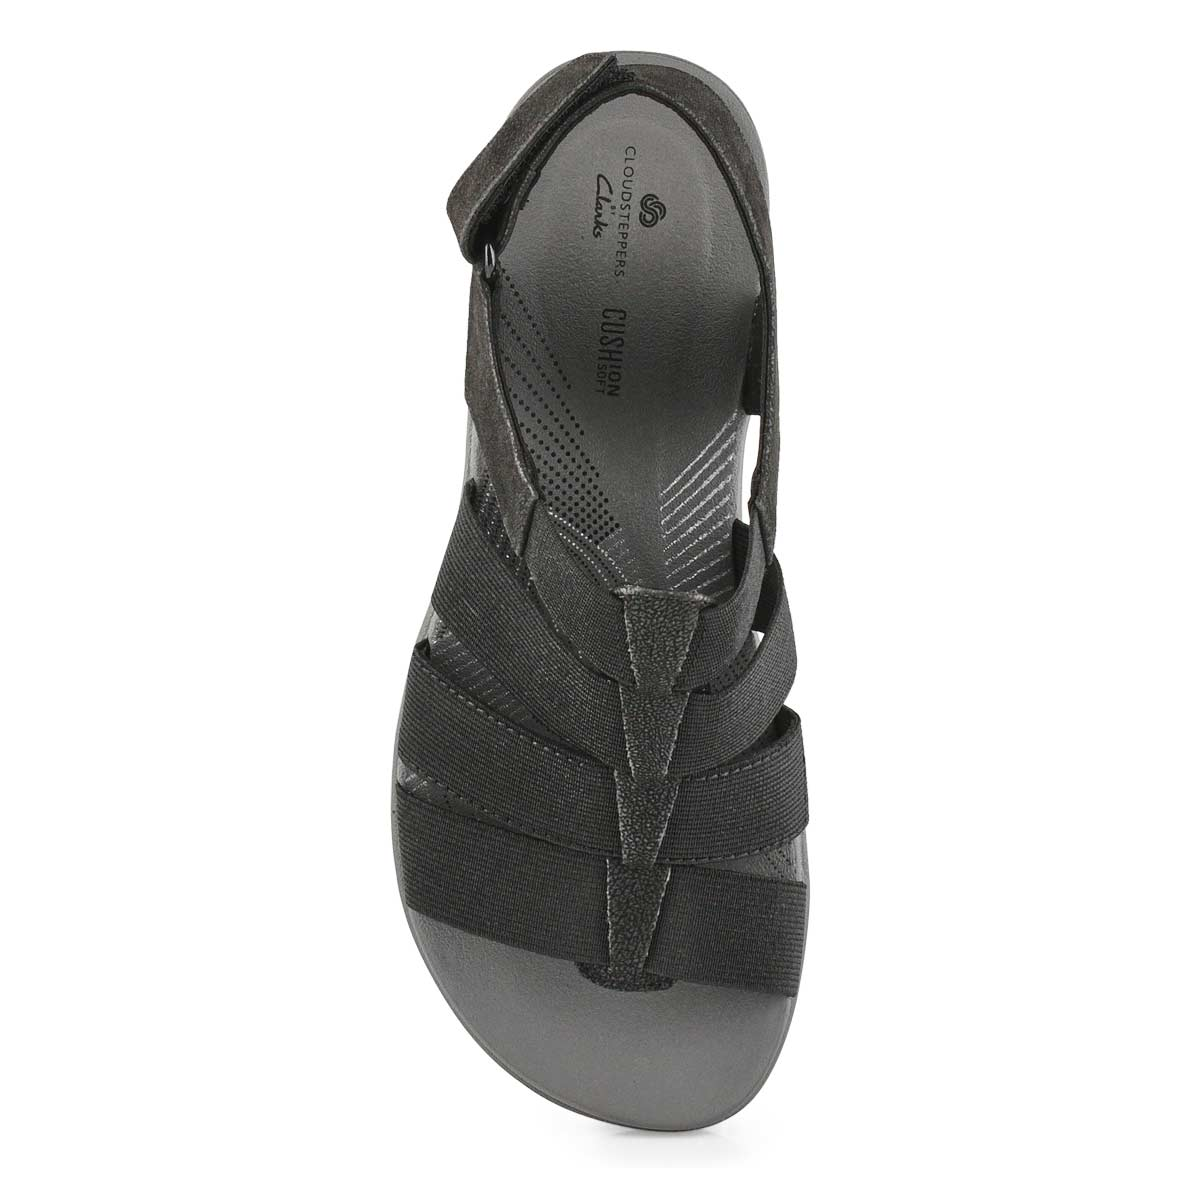 Women's Arla Shaylie Casual Wedge Sandal - Black